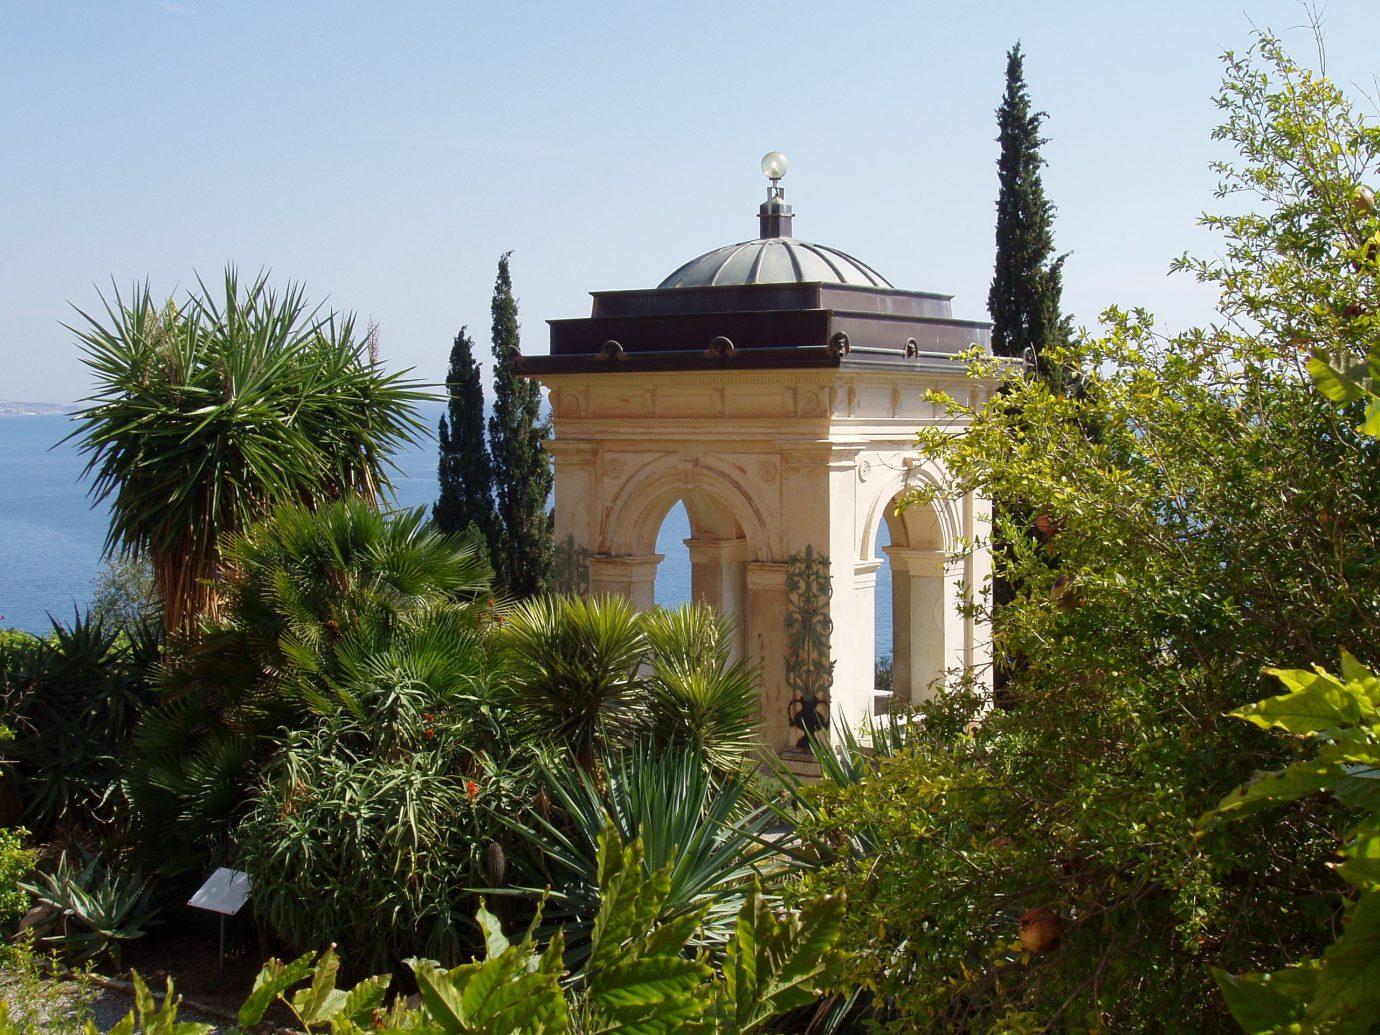 Italy Trip Ideas arecales palm tree estate sky tree plant Villa real estate building mansion house home facade outdoor structure Garden mausoleum chapel